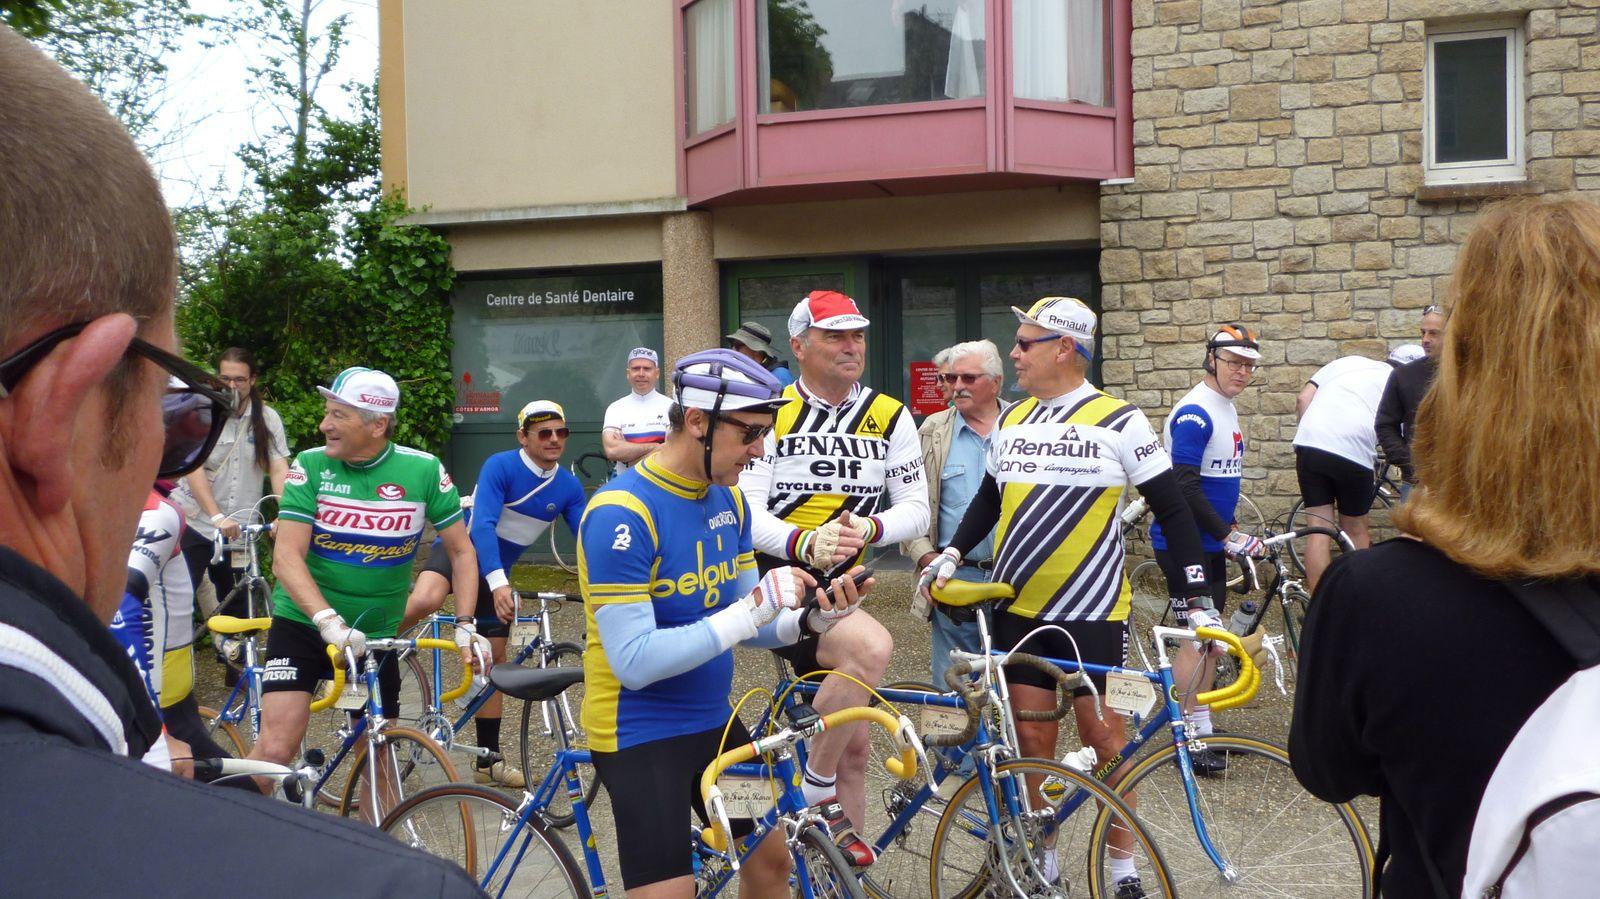 DINAN - Tour de Rance 2015 - Photos du 24 mai 2015